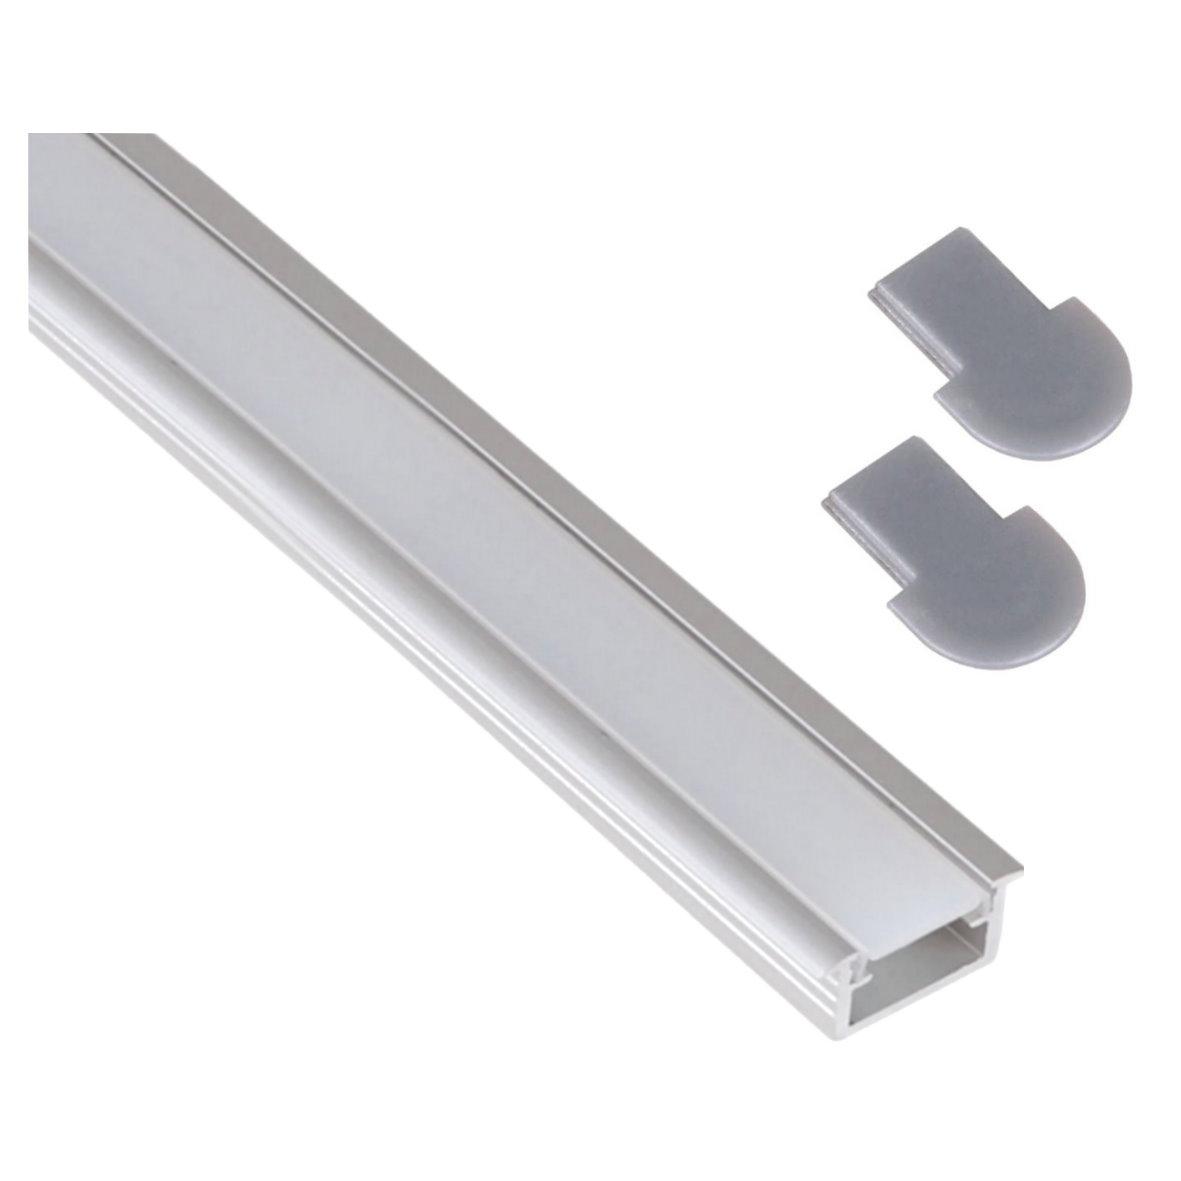 einbau alu profil leiste 2m flach abdeckung opal endkappe f r led stripe ebay. Black Bedroom Furniture Sets. Home Design Ideas